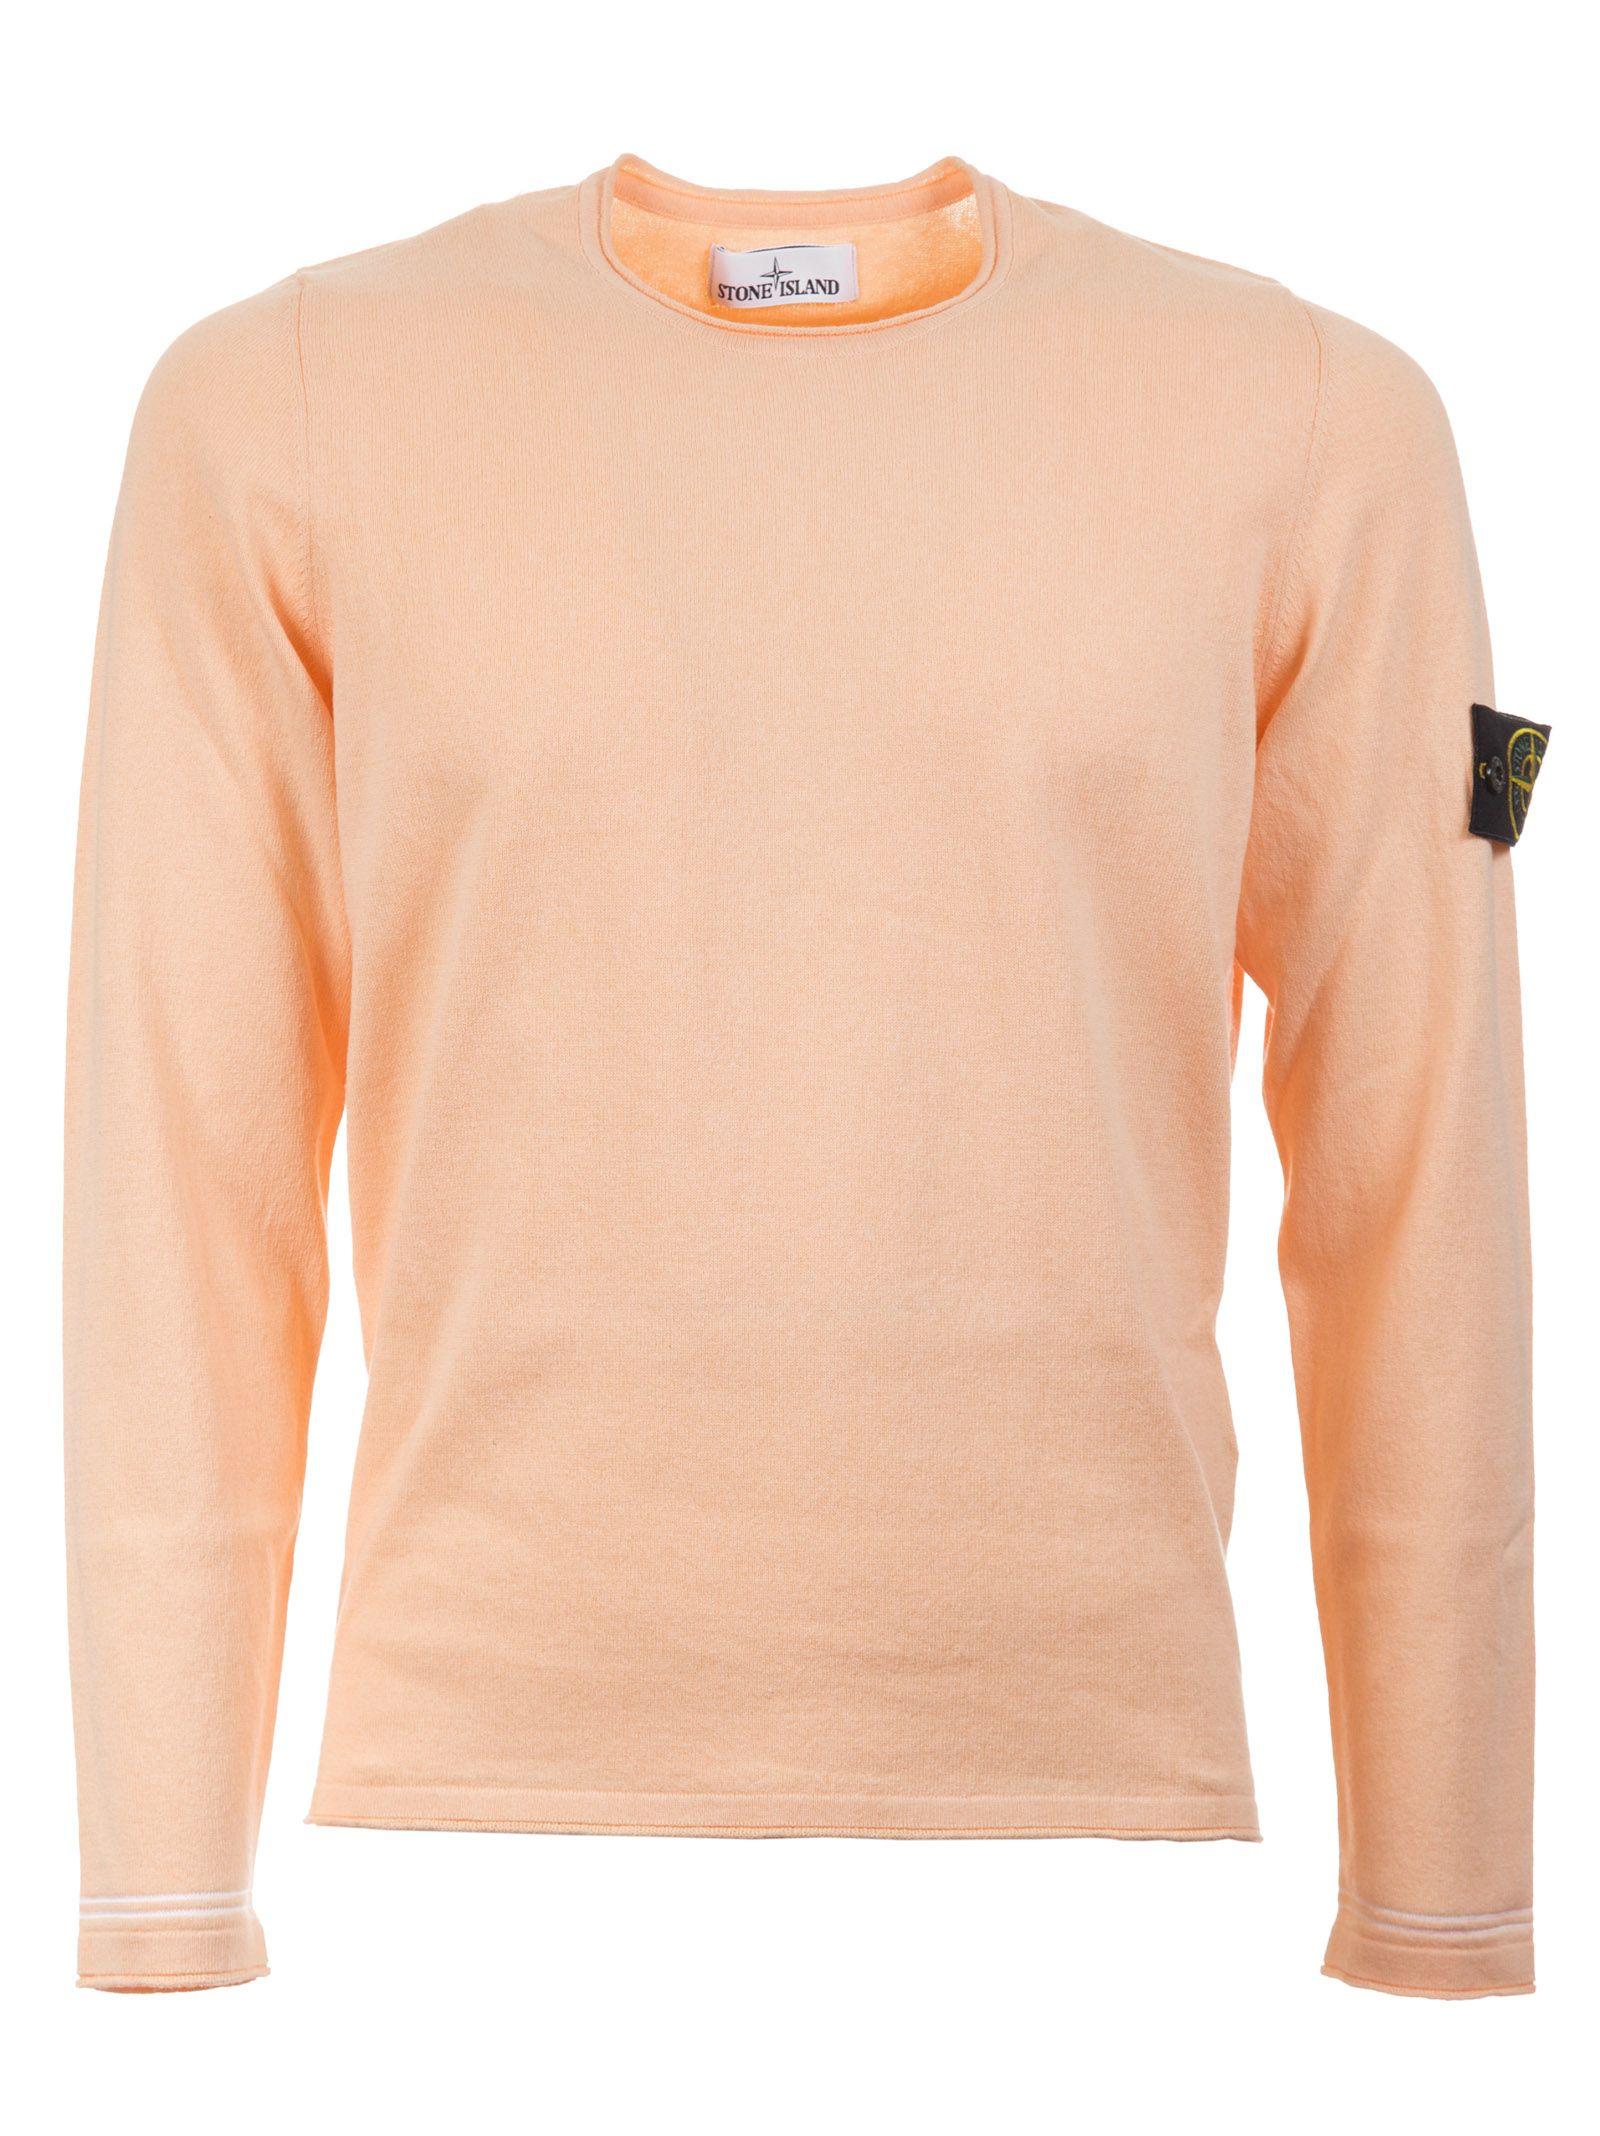 stone island stone island logo patch sweater orange men 39 s sweaters italist. Black Bedroom Furniture Sets. Home Design Ideas